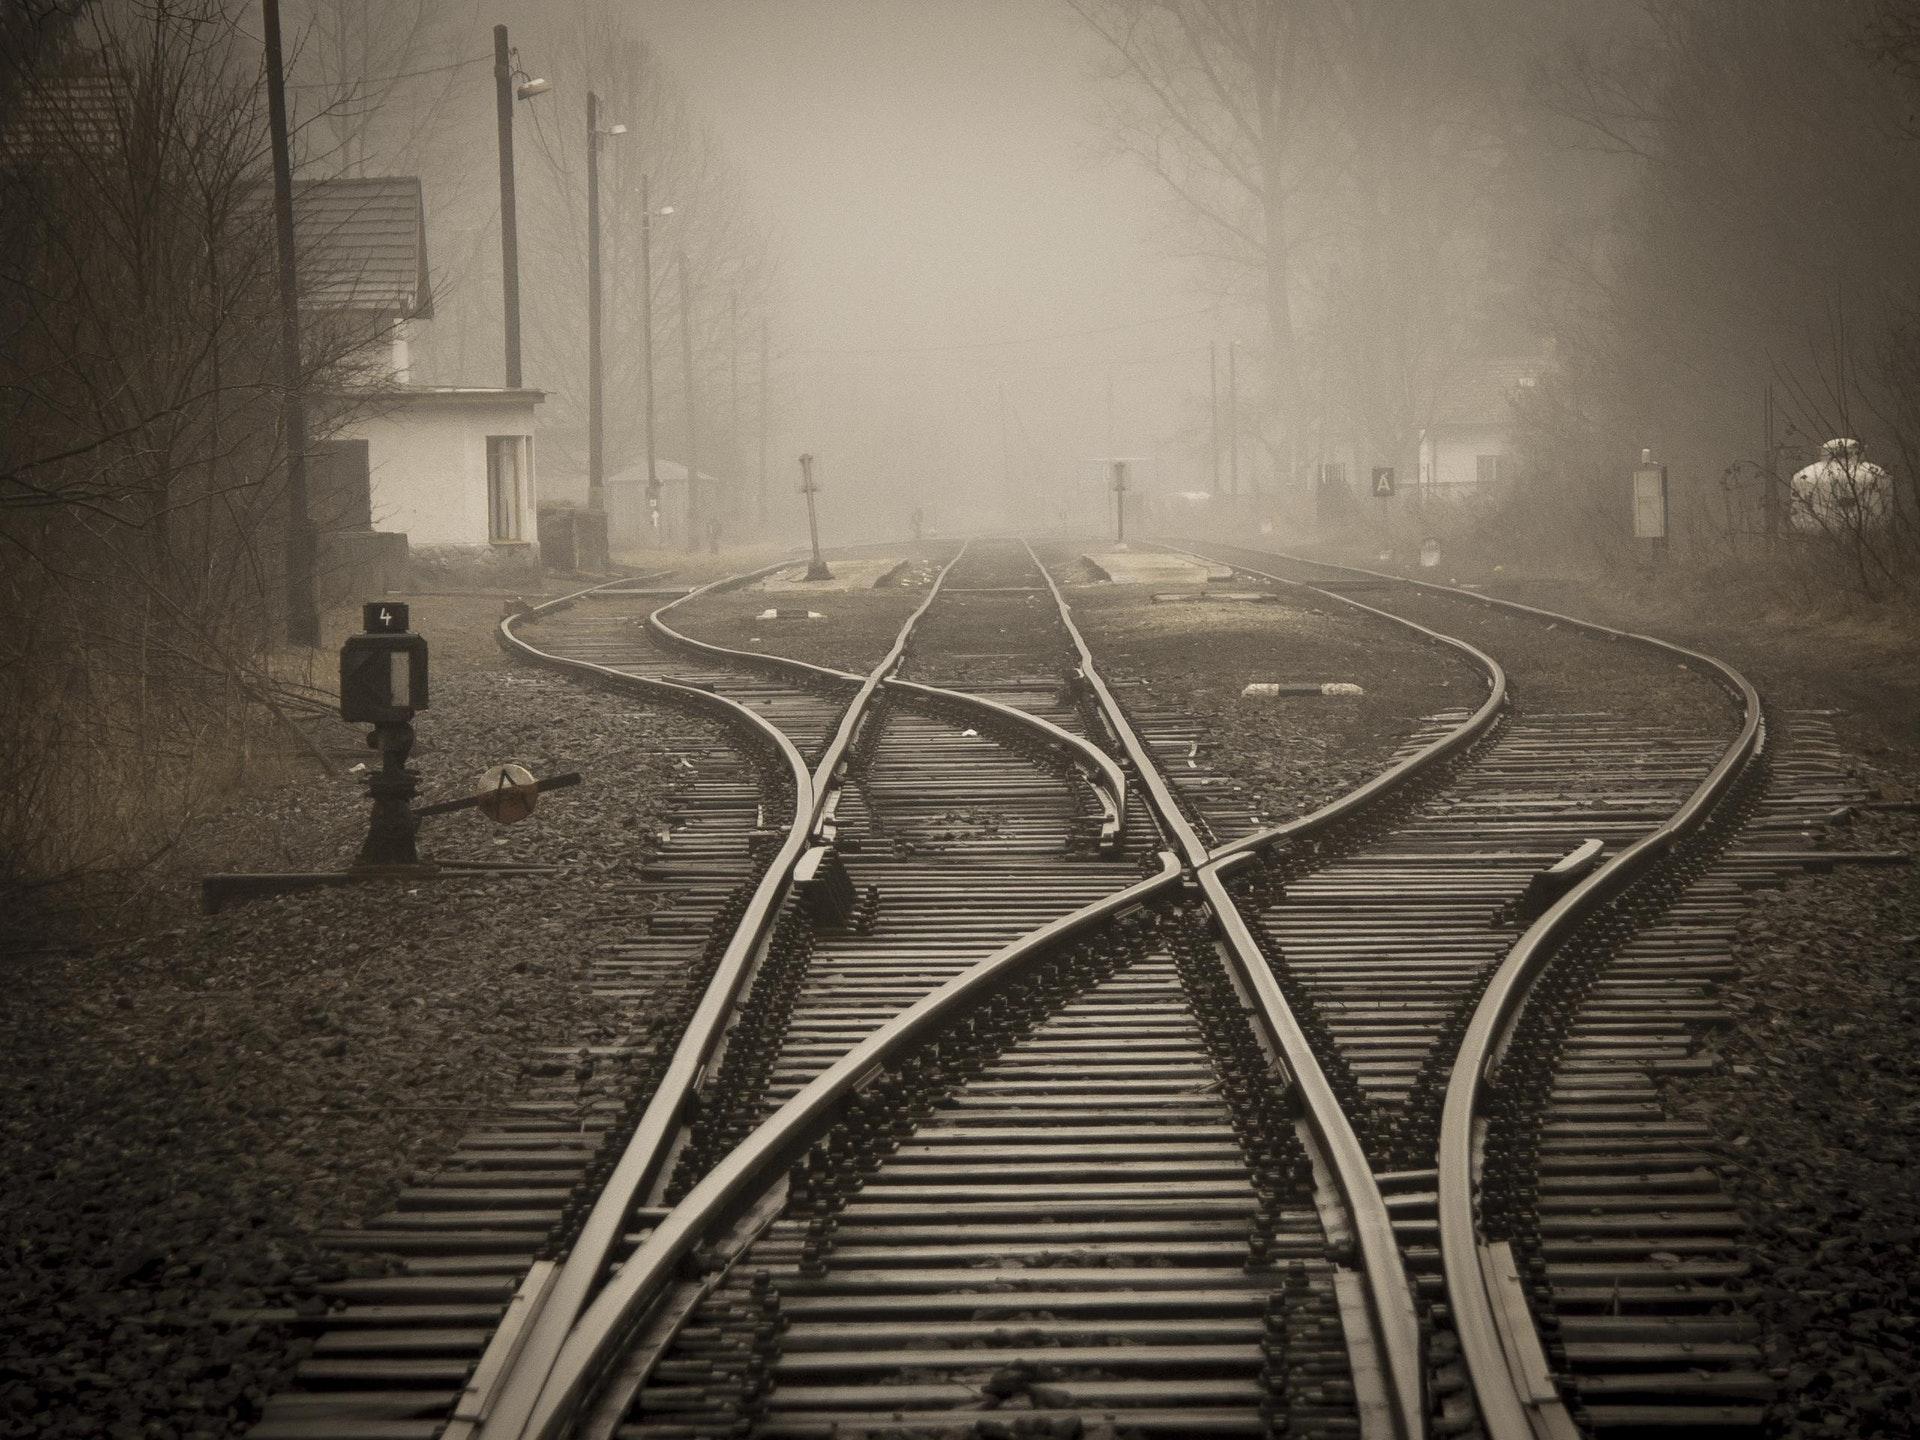 three railroad tracks converge